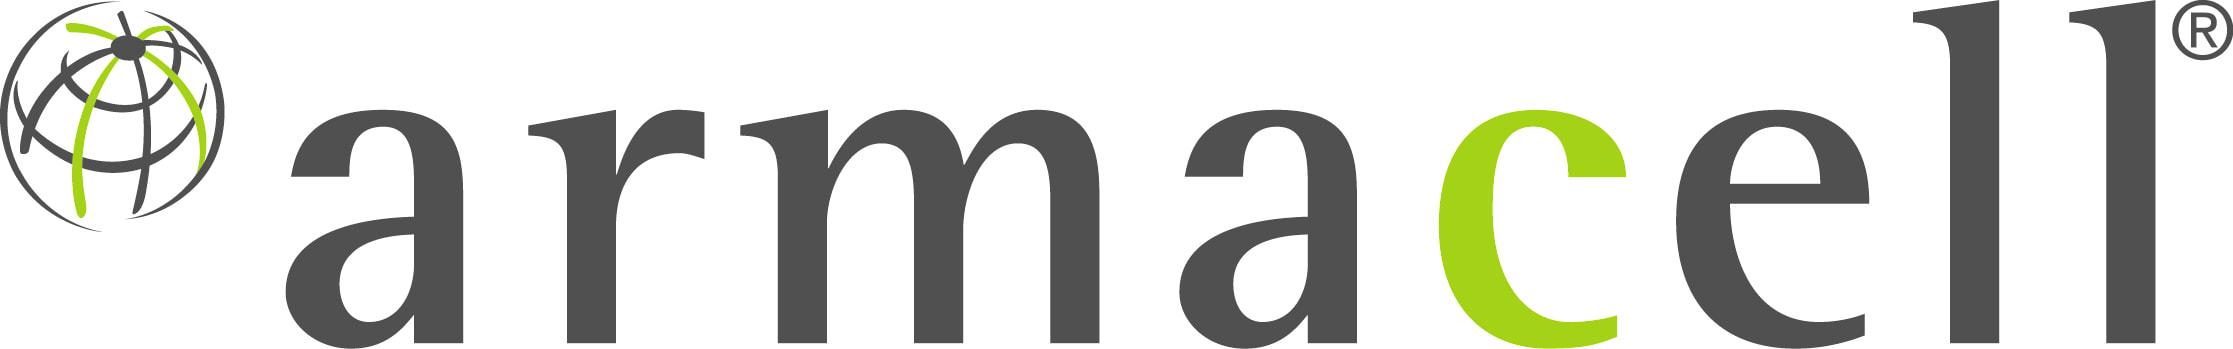 new-armacell-logo-cmyk-002_orig.jpg